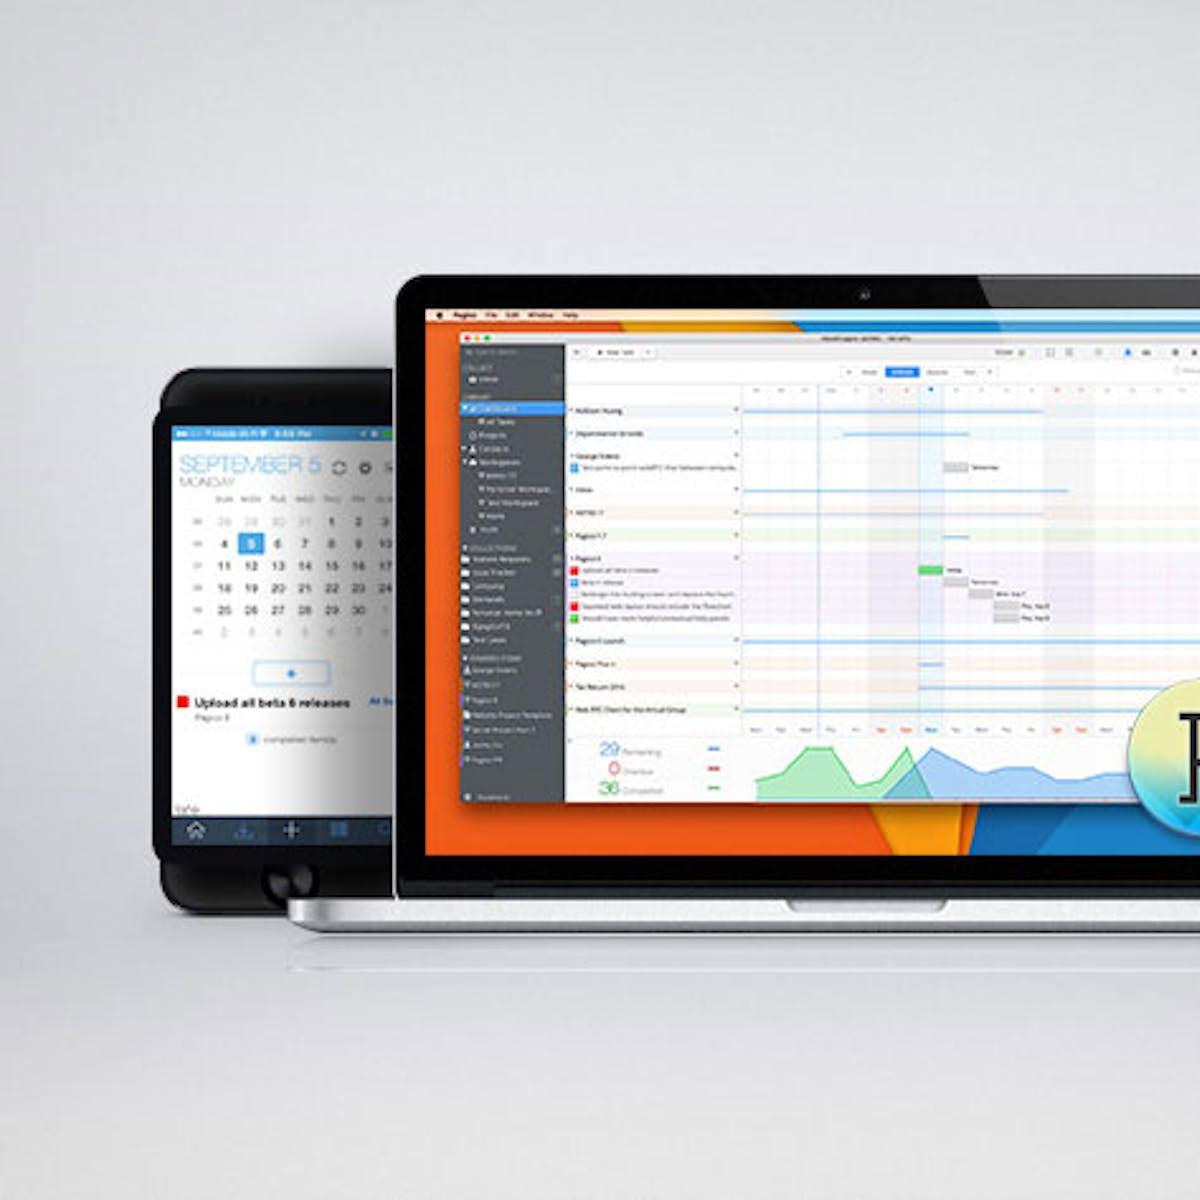 The Task Management App Puts Wunderlist and Todoist to Shame